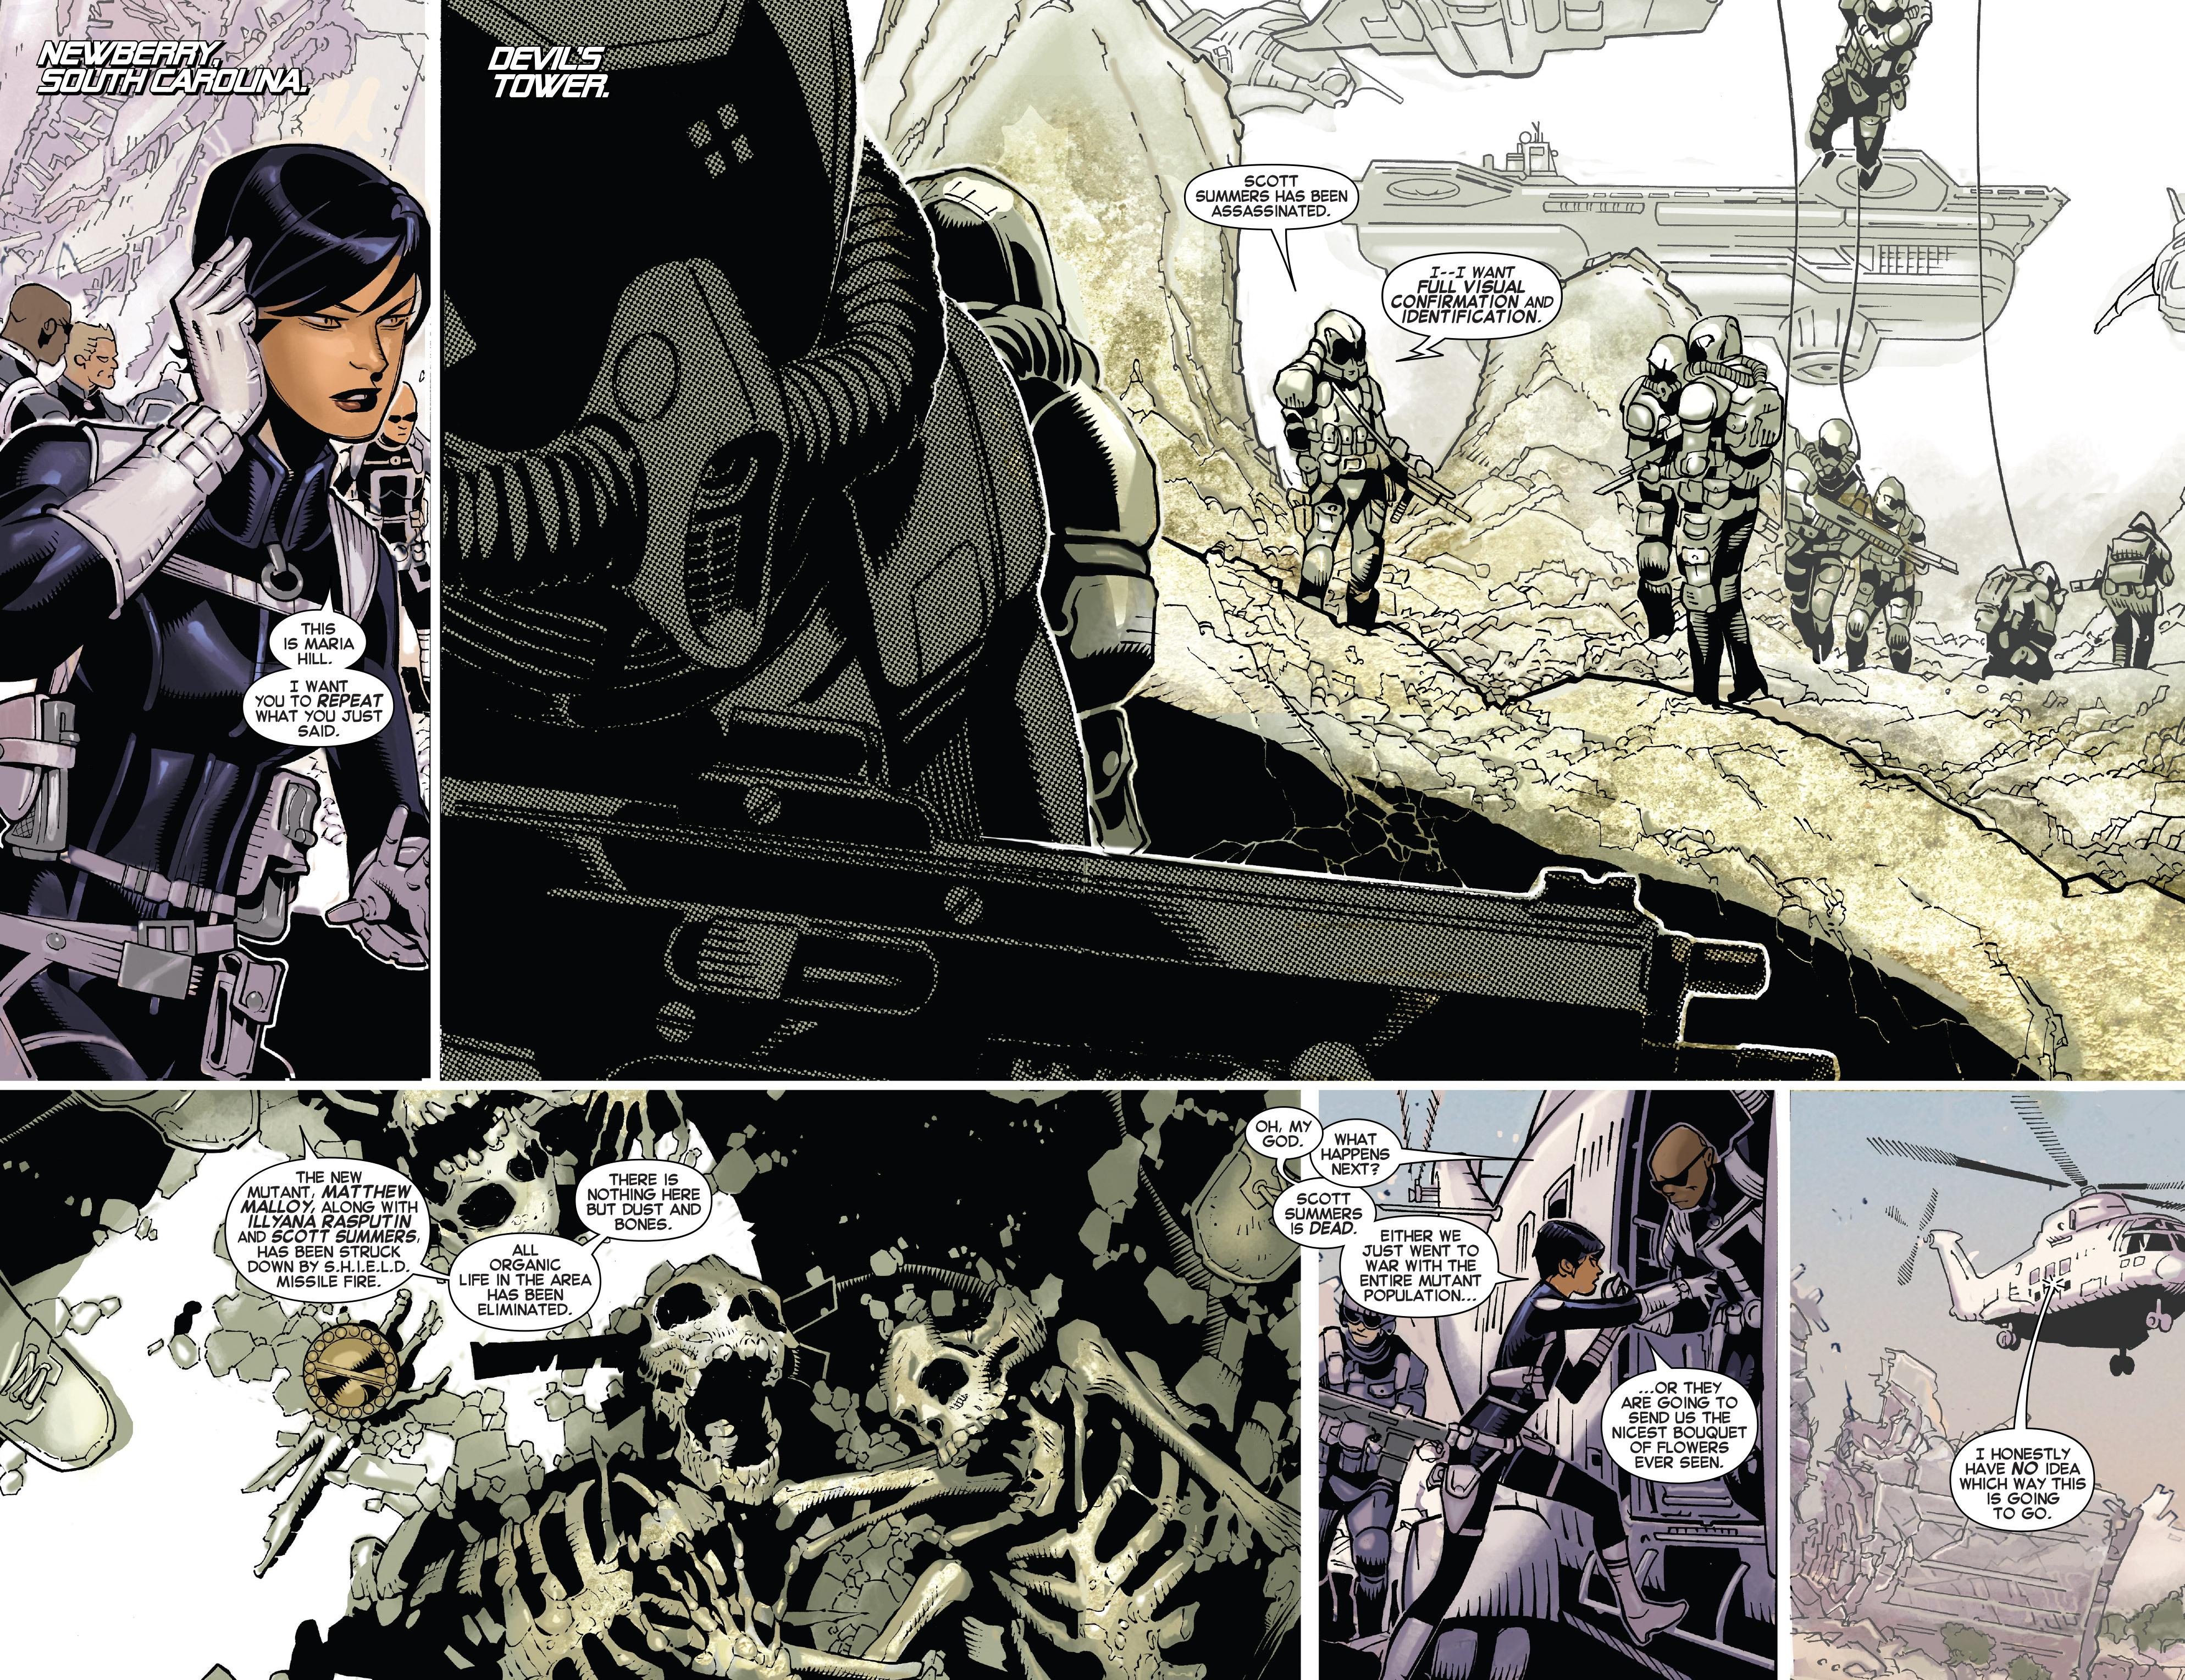 Read online Uncanny X-Men (2013) comic -  Issue # _TPB 5 - The Omega Mutant - 78